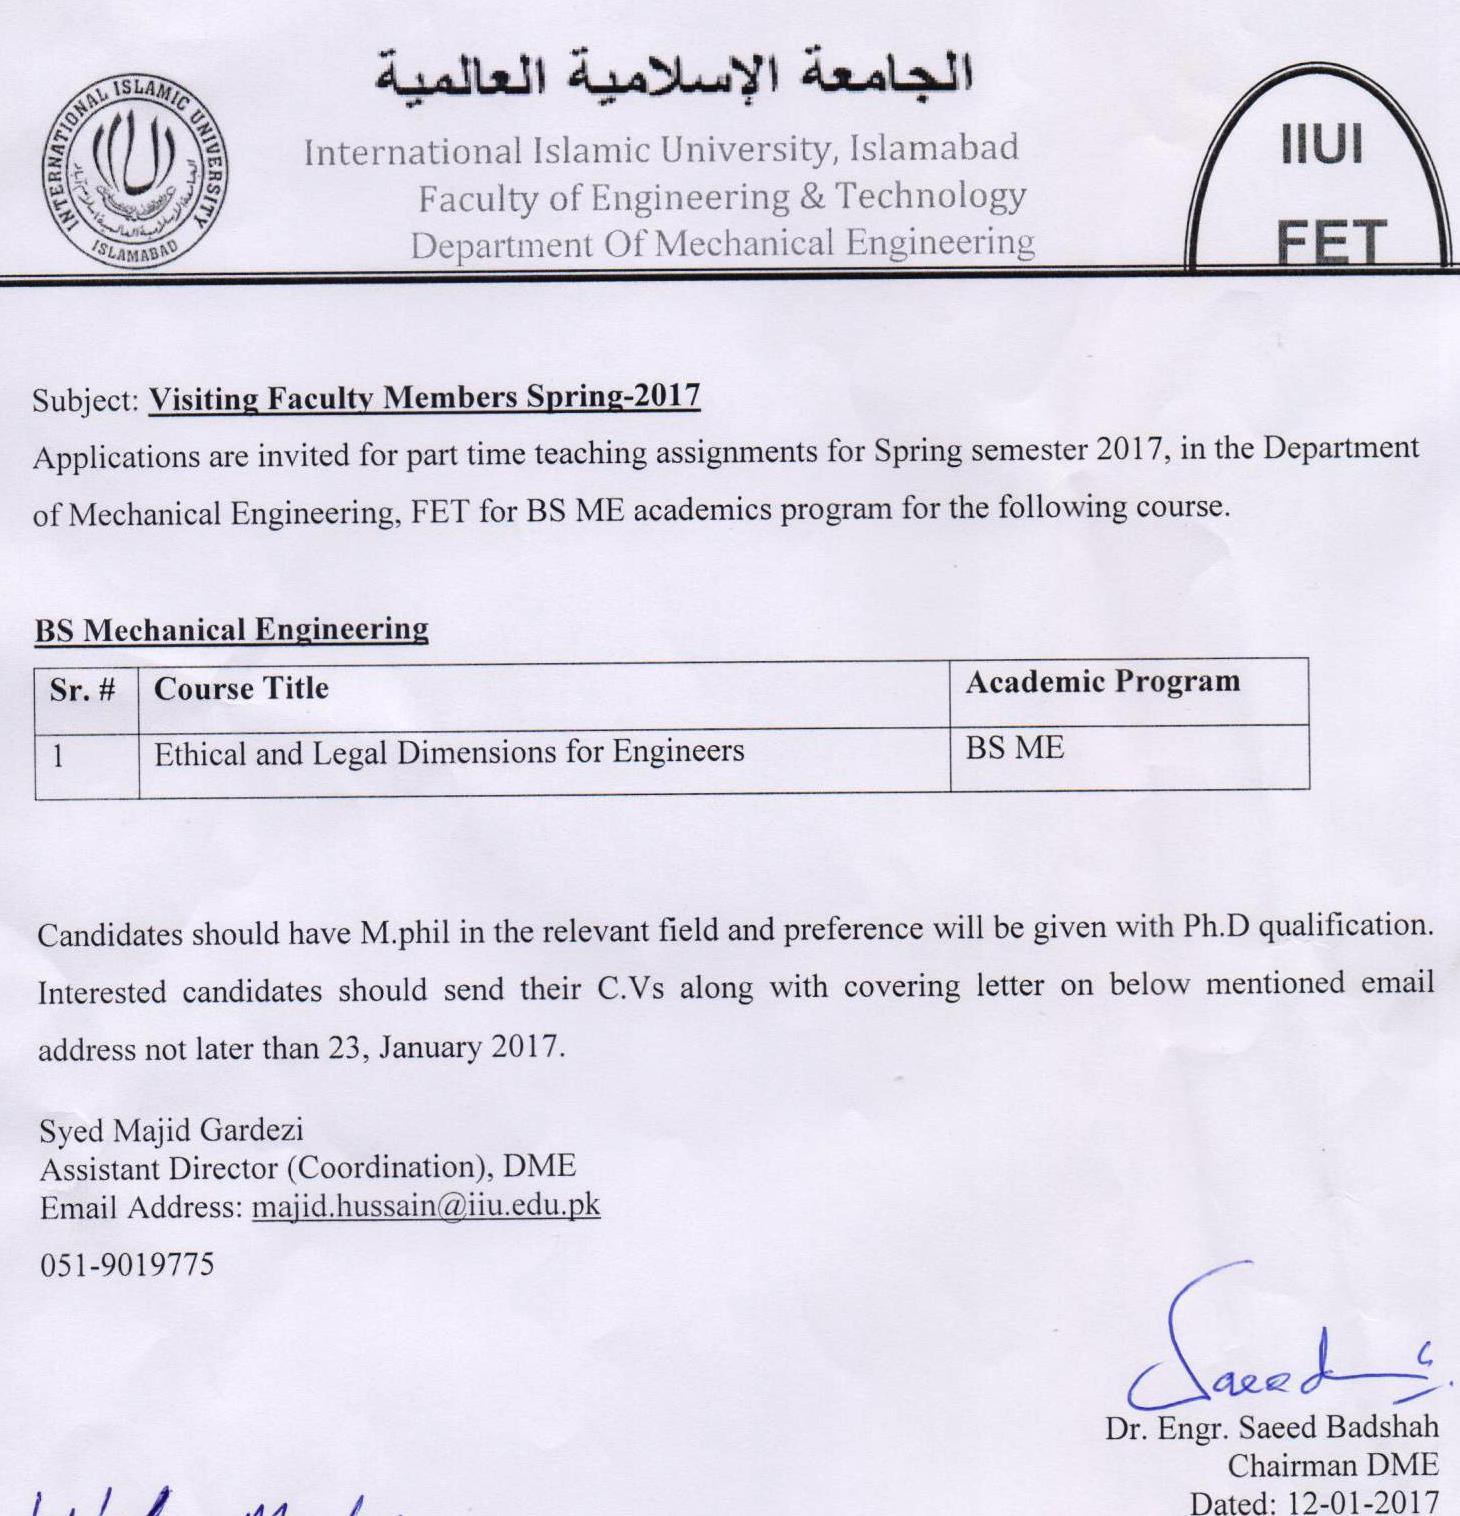 university jobs international islamic university ing faculty male department of mechanical engineering